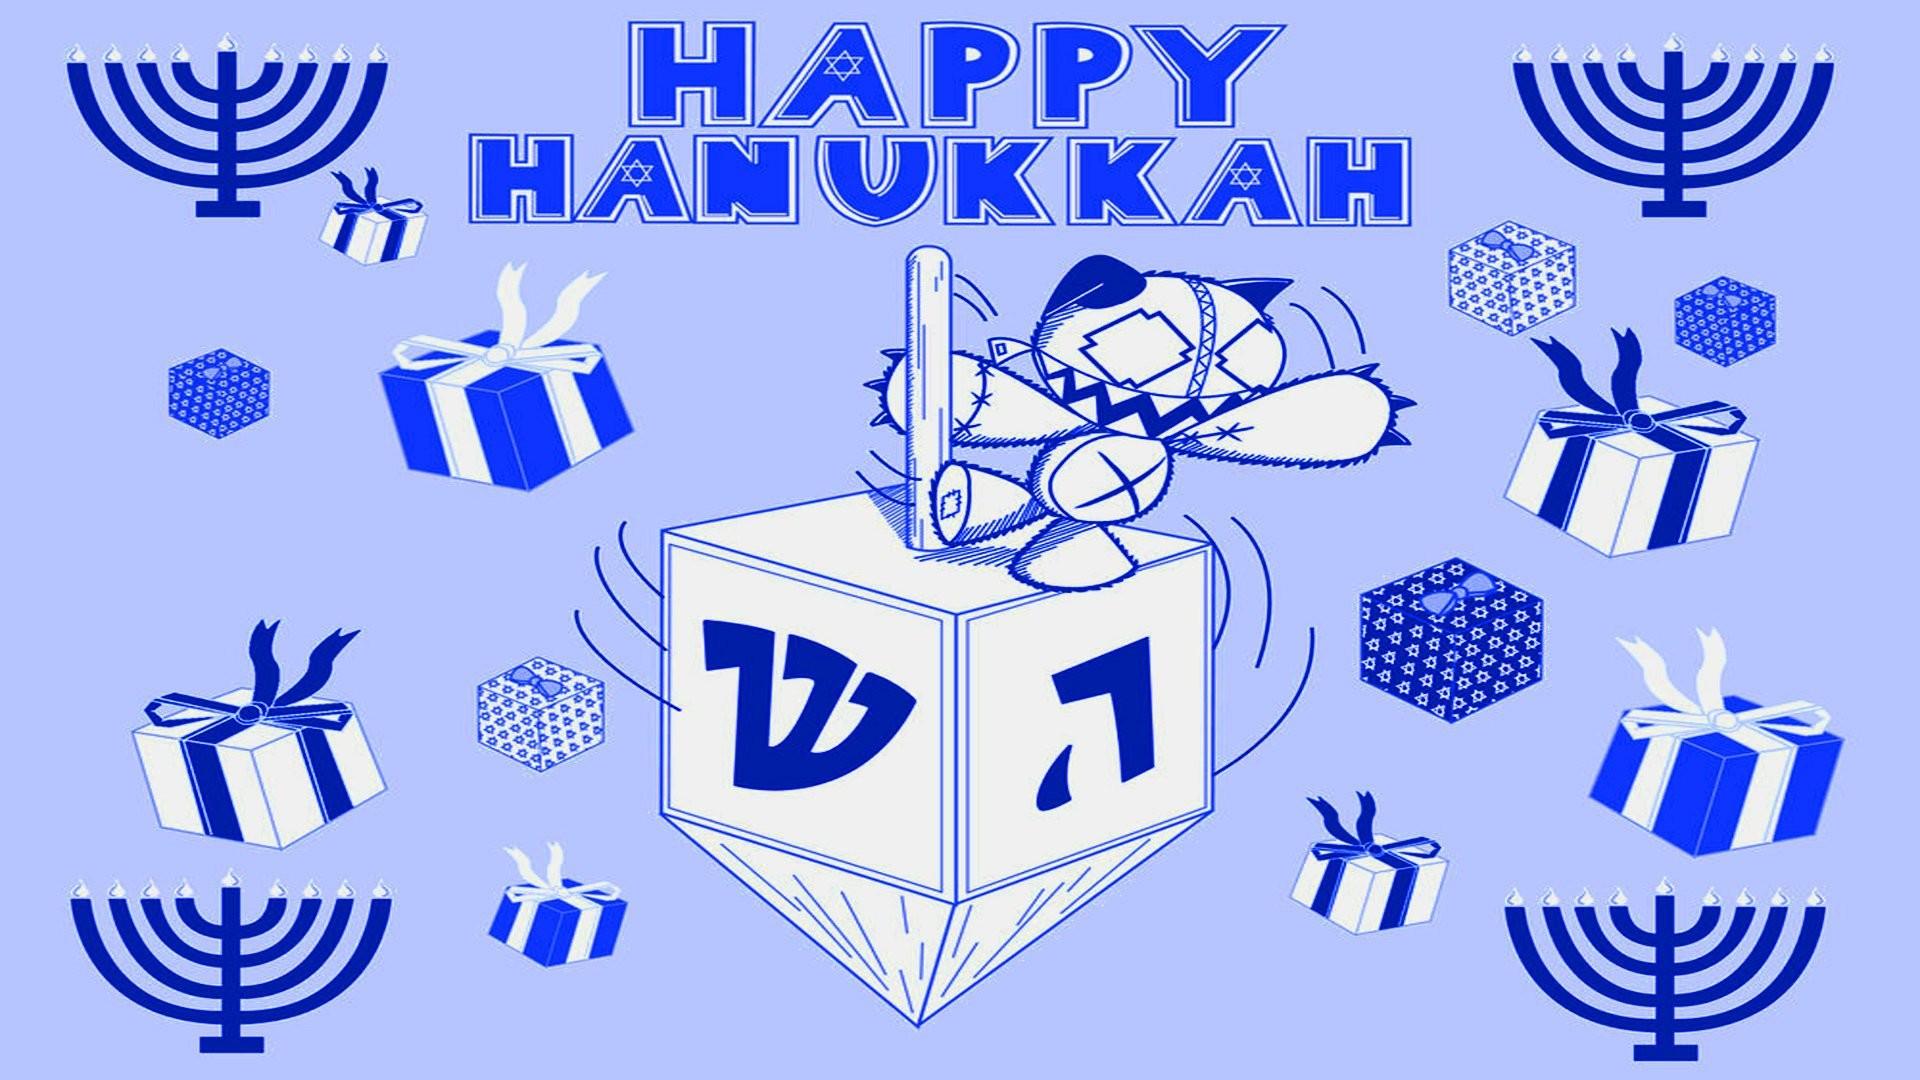 HANUKKAH jewish festival holiday candelabrum candle menorah hanukiah  Chanukah wallpaper     555263   WallpaperUP